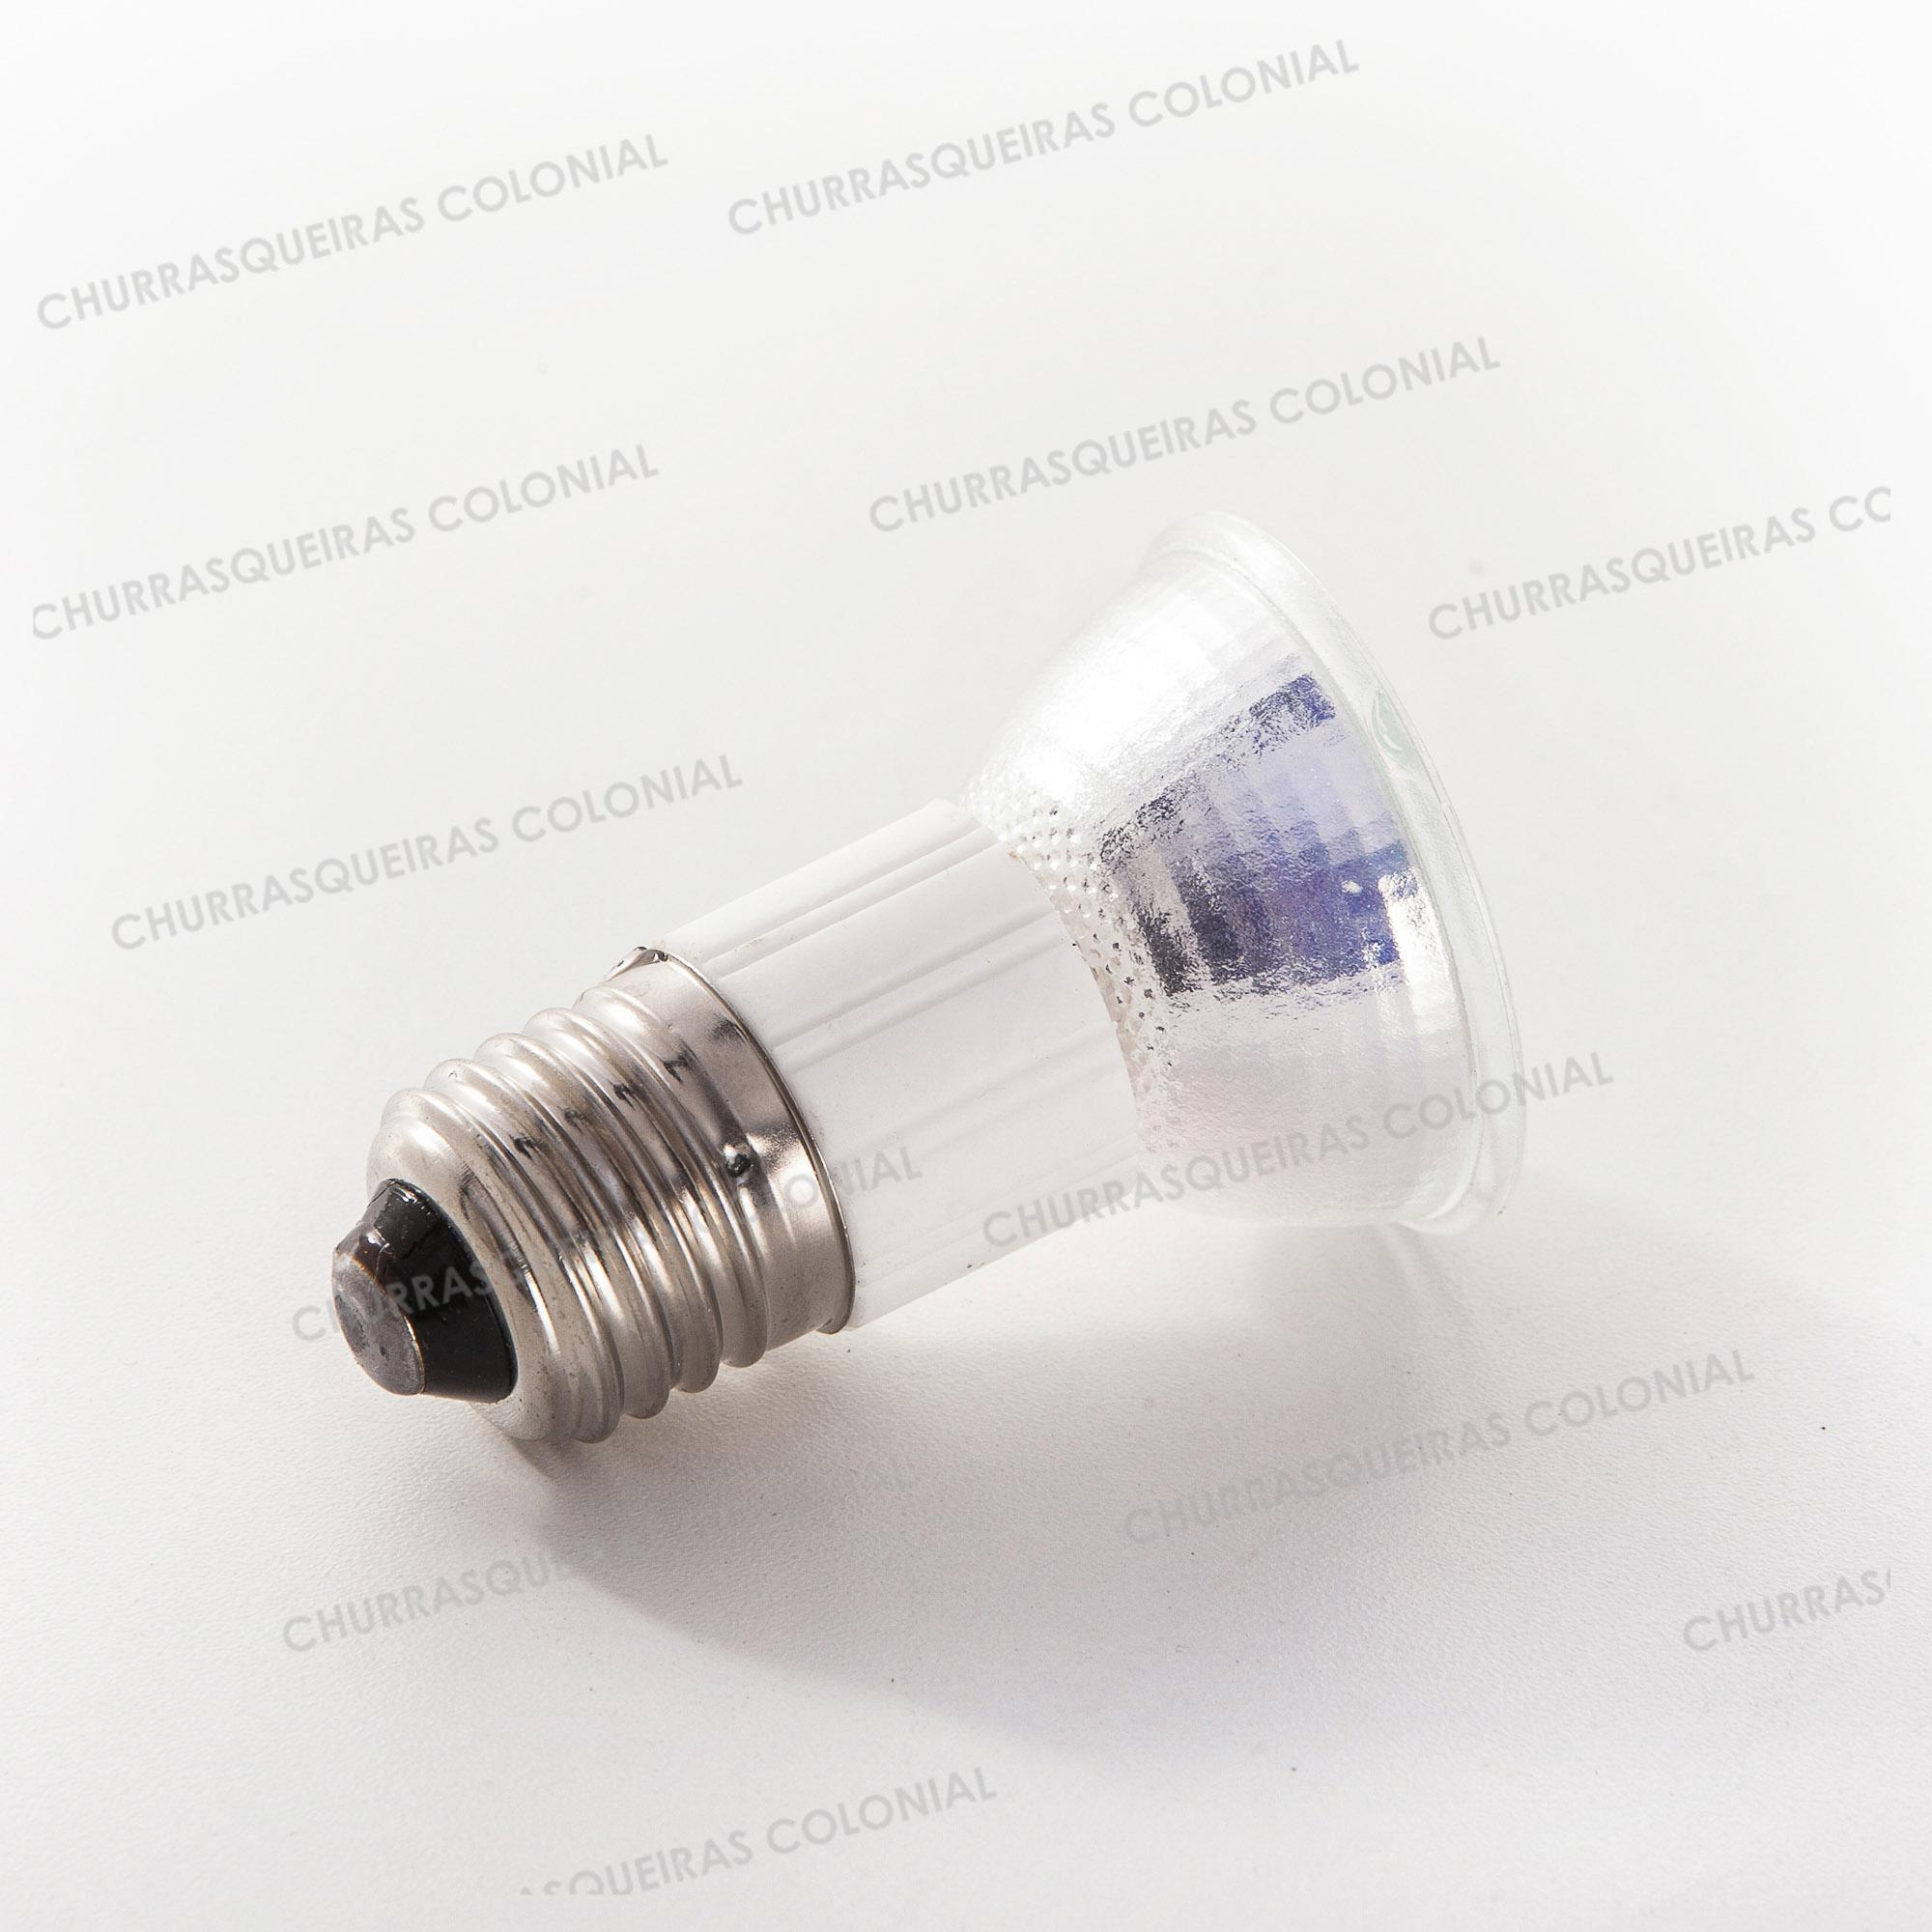 Lâmpada Dicróica JDR MR16 50 W 220 V